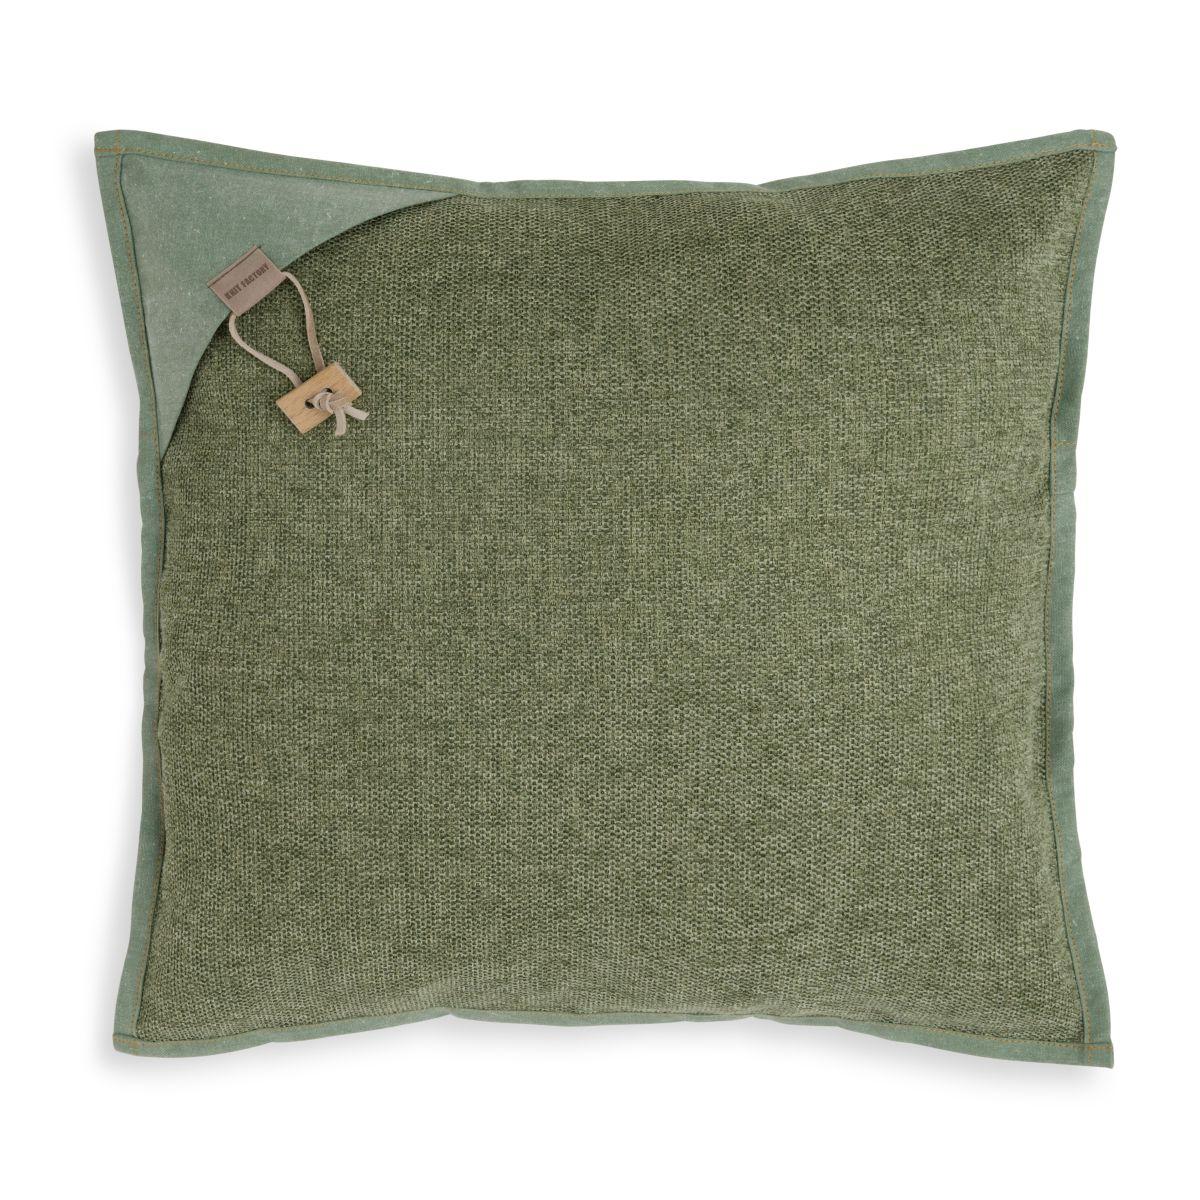 knit factory kf154012014 hope kussen groen 50x50 1